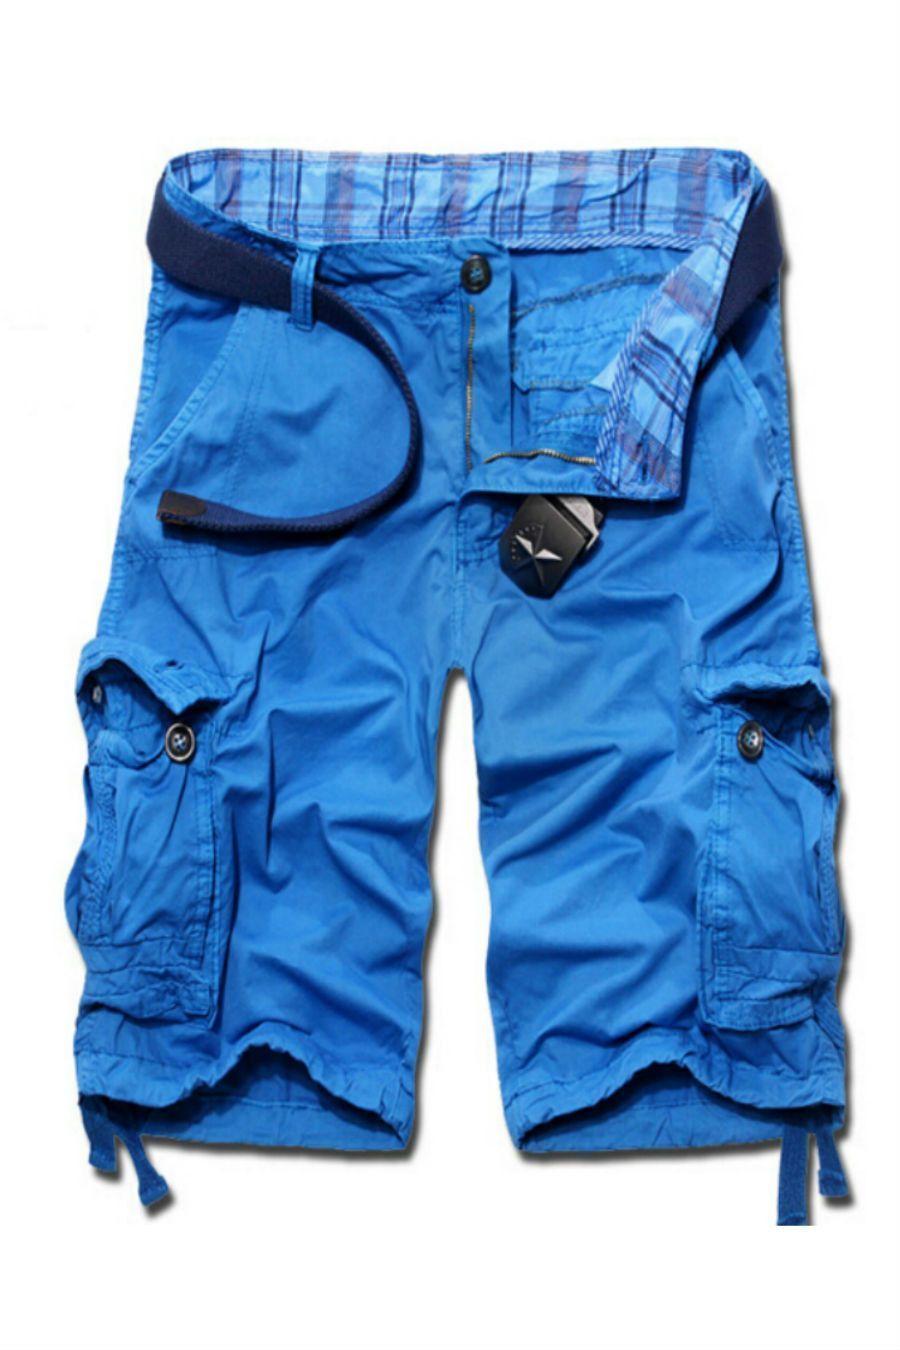 a5ec3368eb3 Men s Casual Cargo Shorts In Blue in 2019